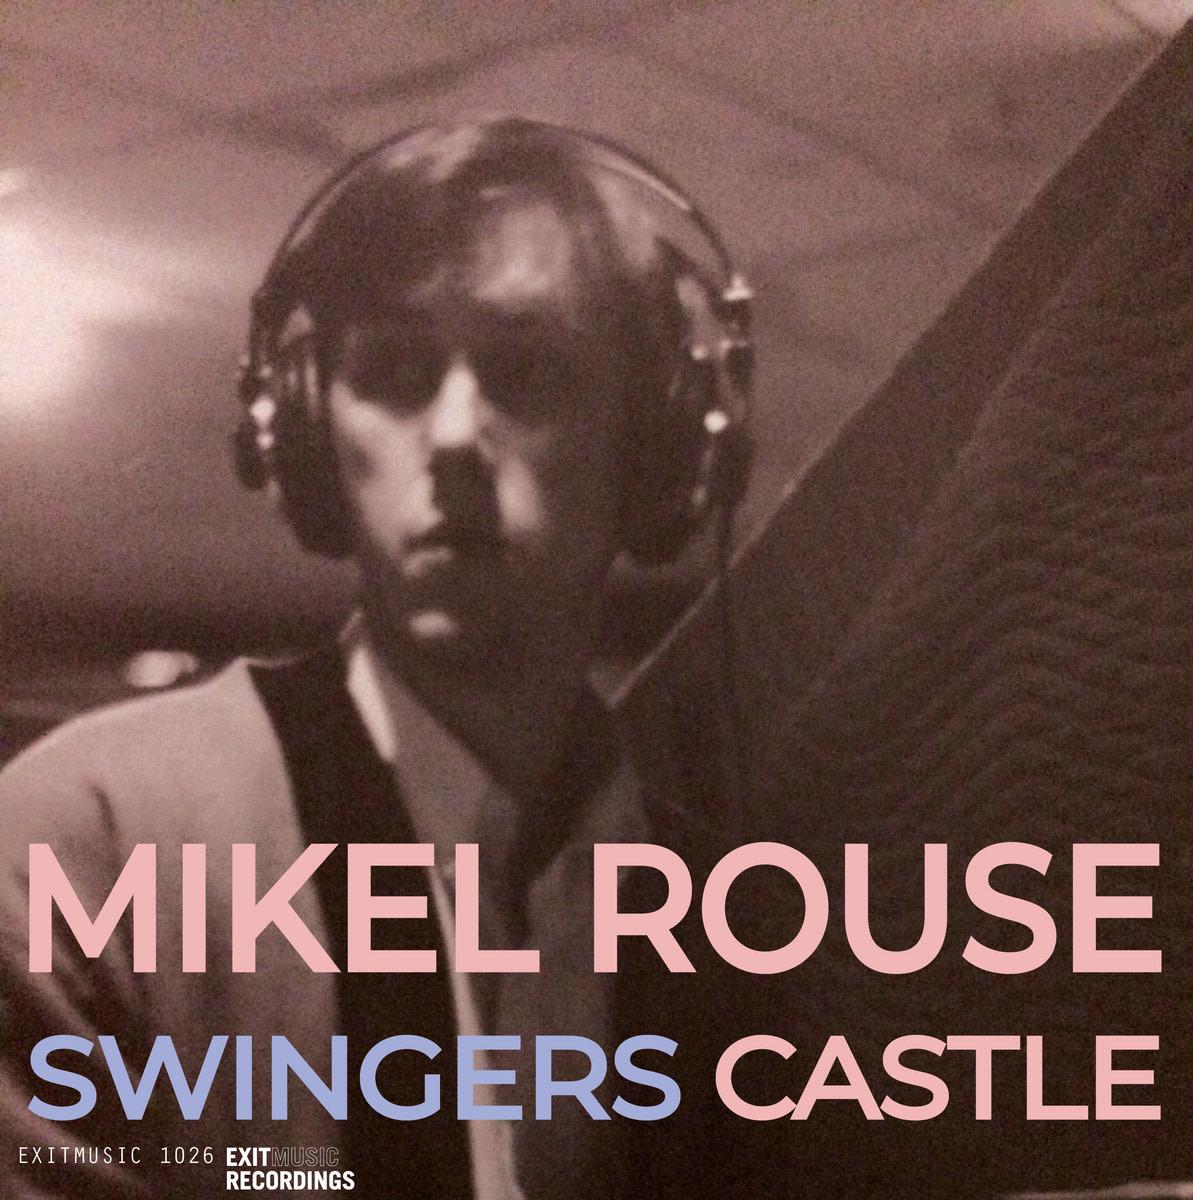 Mikel Rouse, Swingers Castle